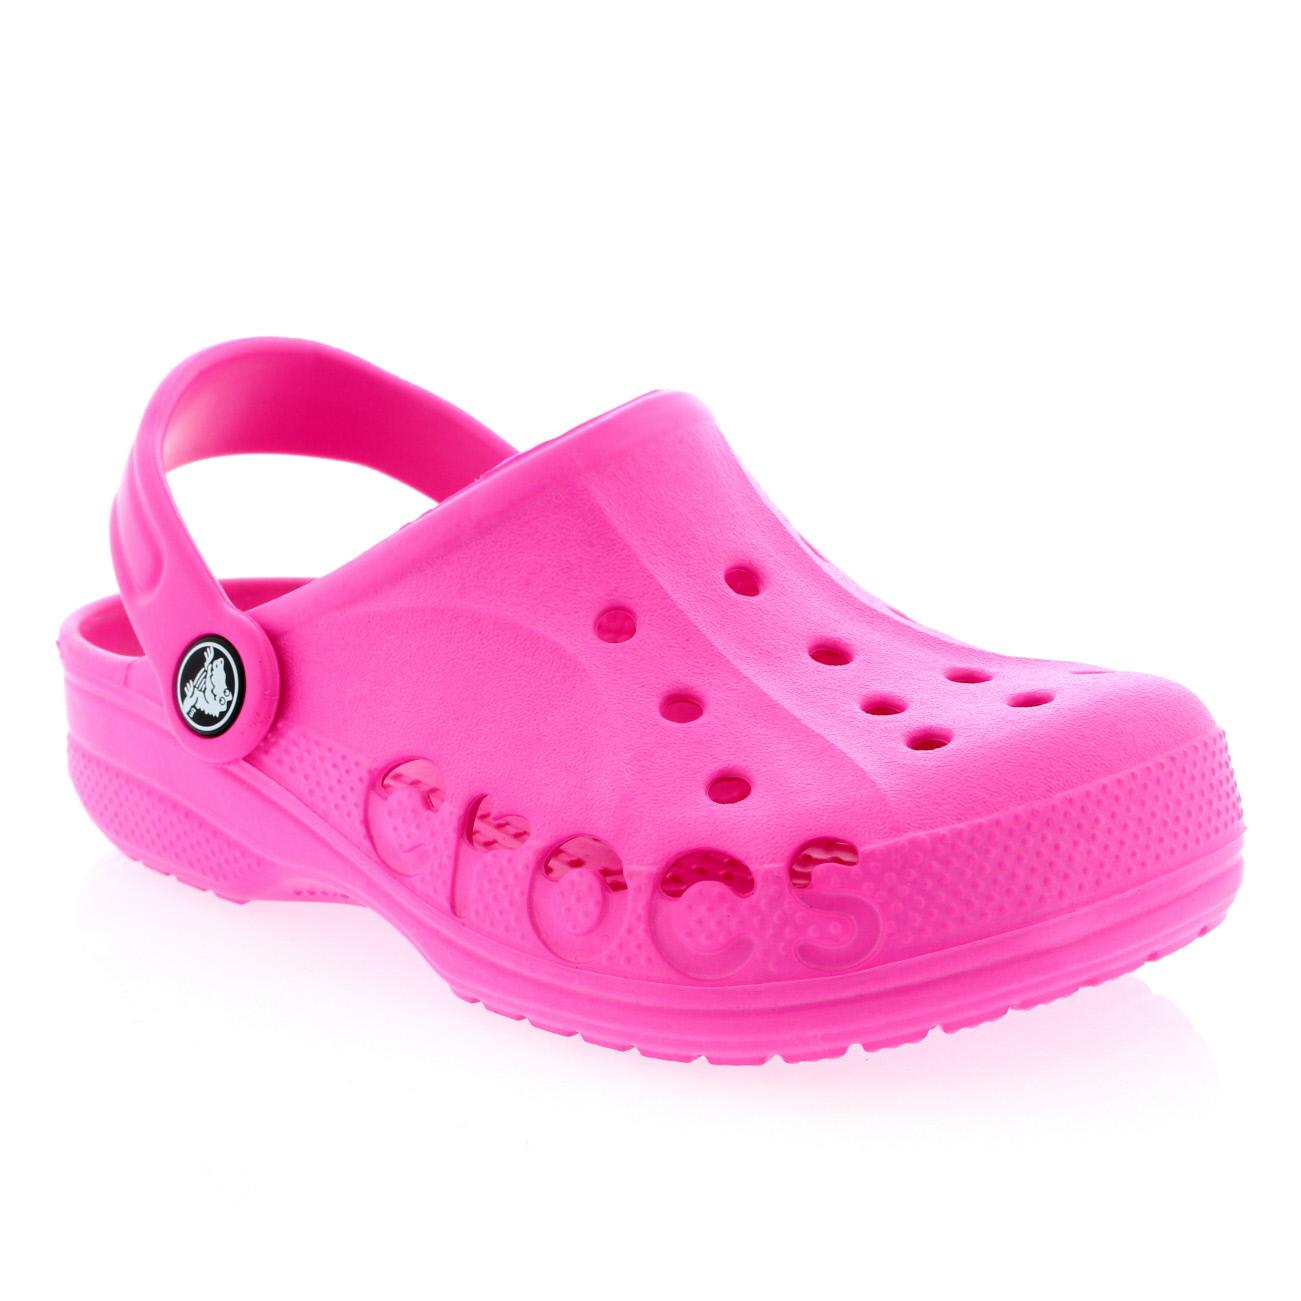 Unisex Kids Junior Crocs Baya